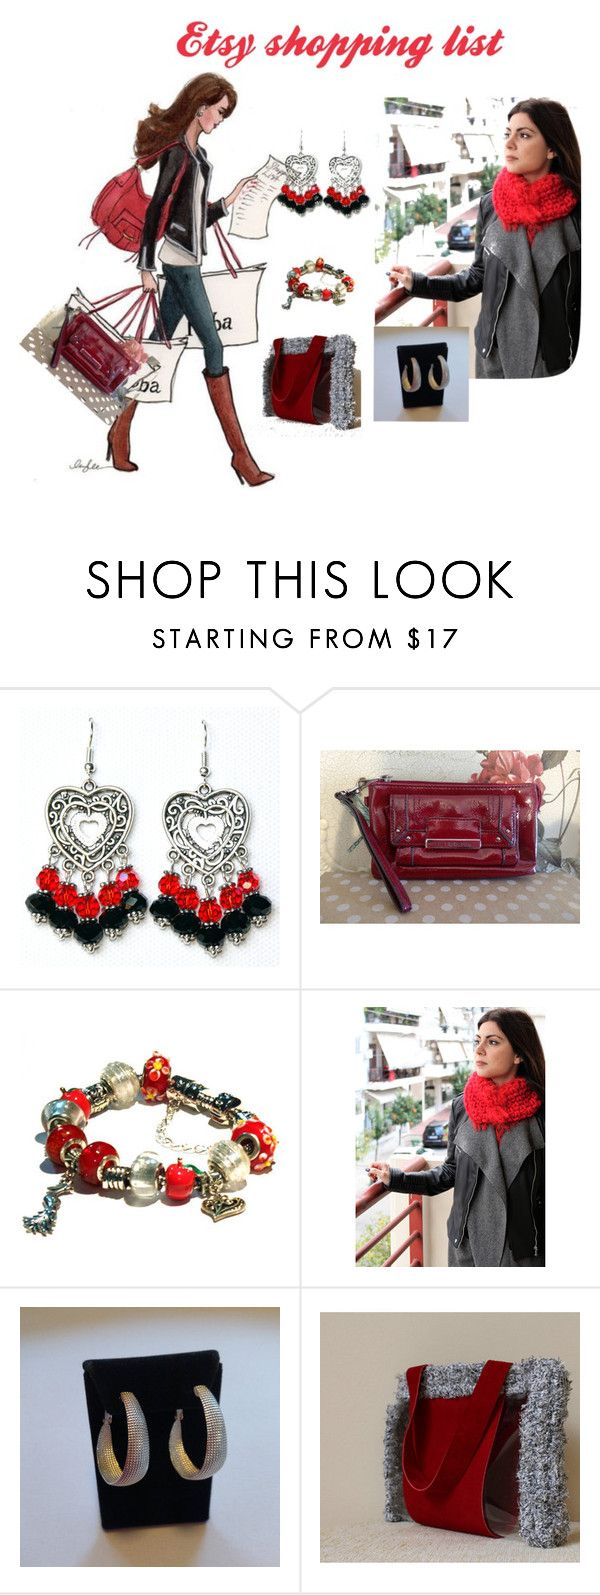 Etsy shopping list by mariliart on Polyvore featuring Handle, Liz Claiborne and vintage @yanamisitreasures @onlybiju @MariliartbyM